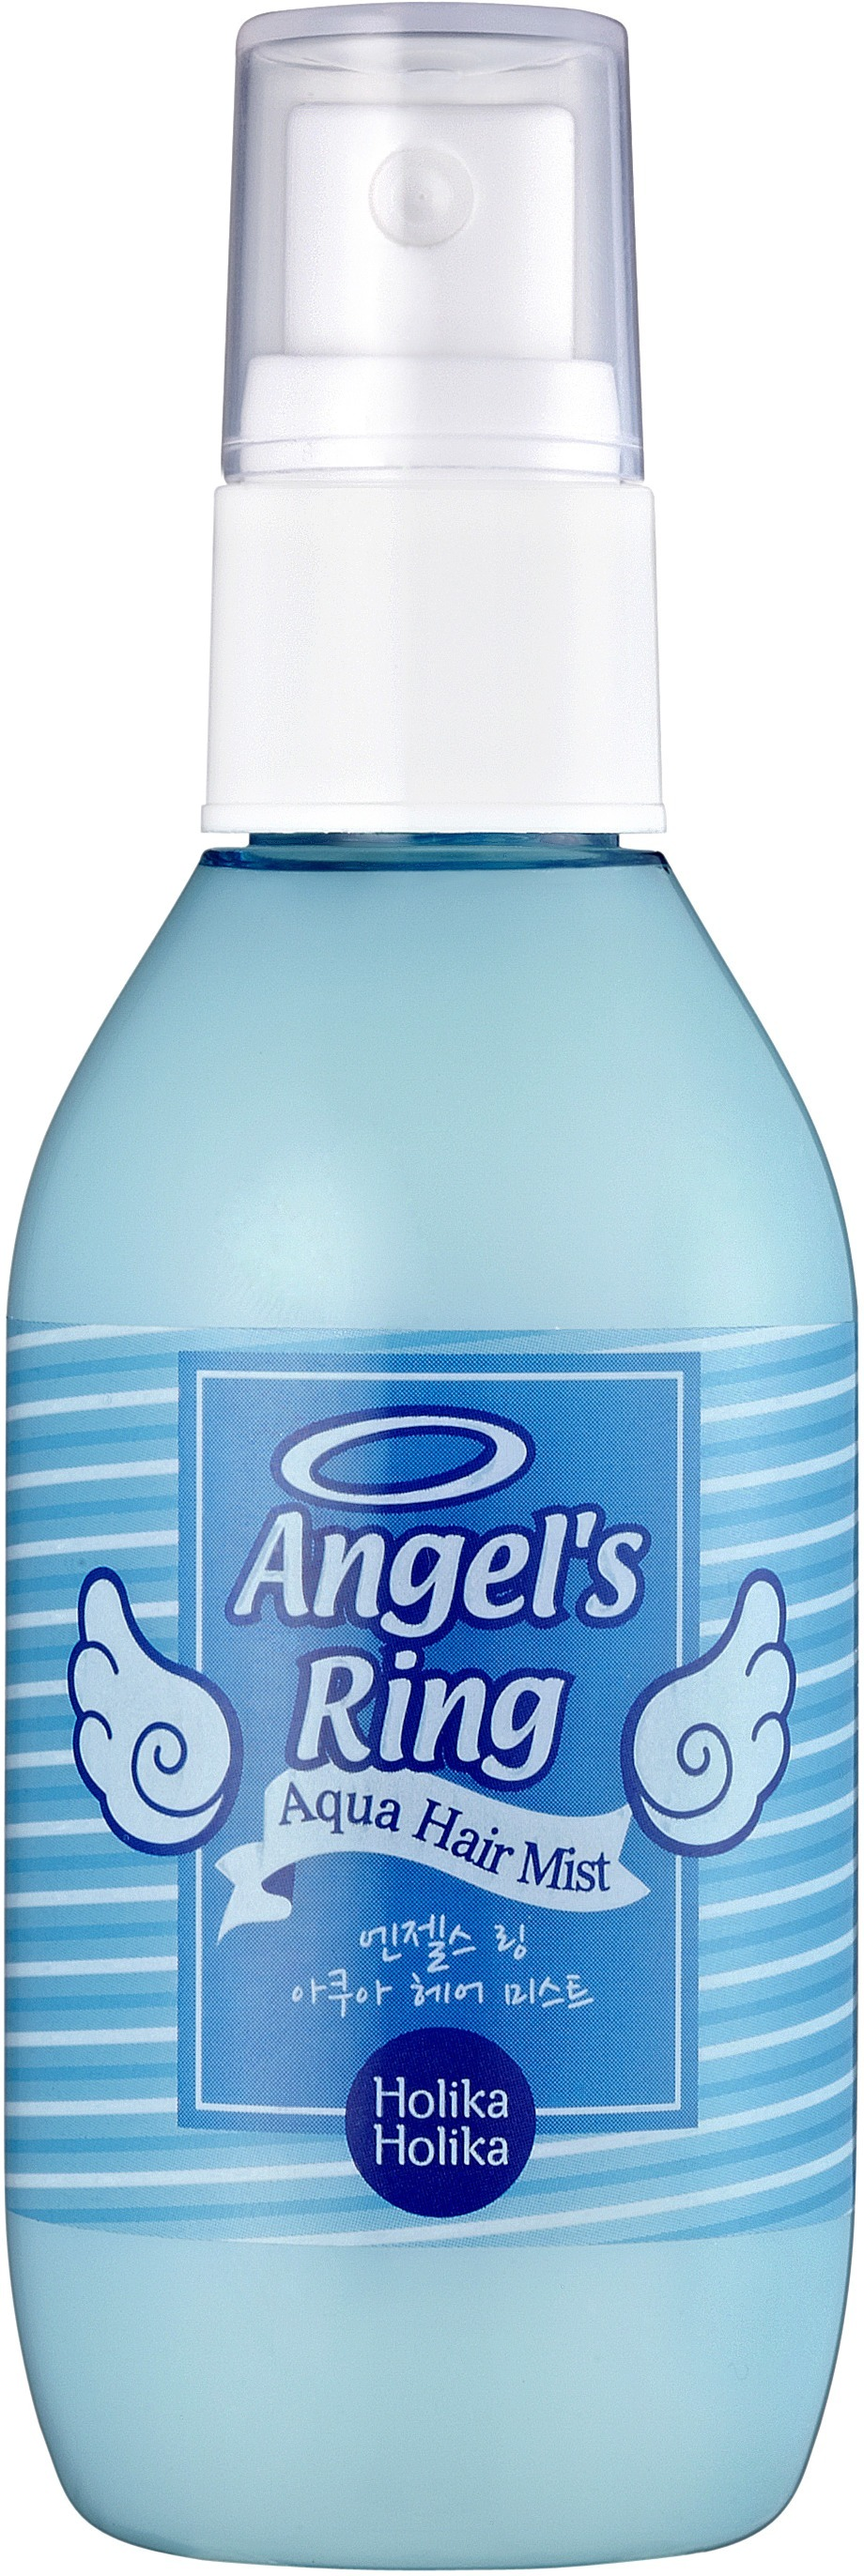 Holika Holika Angels Ring Aqua Hair Mist